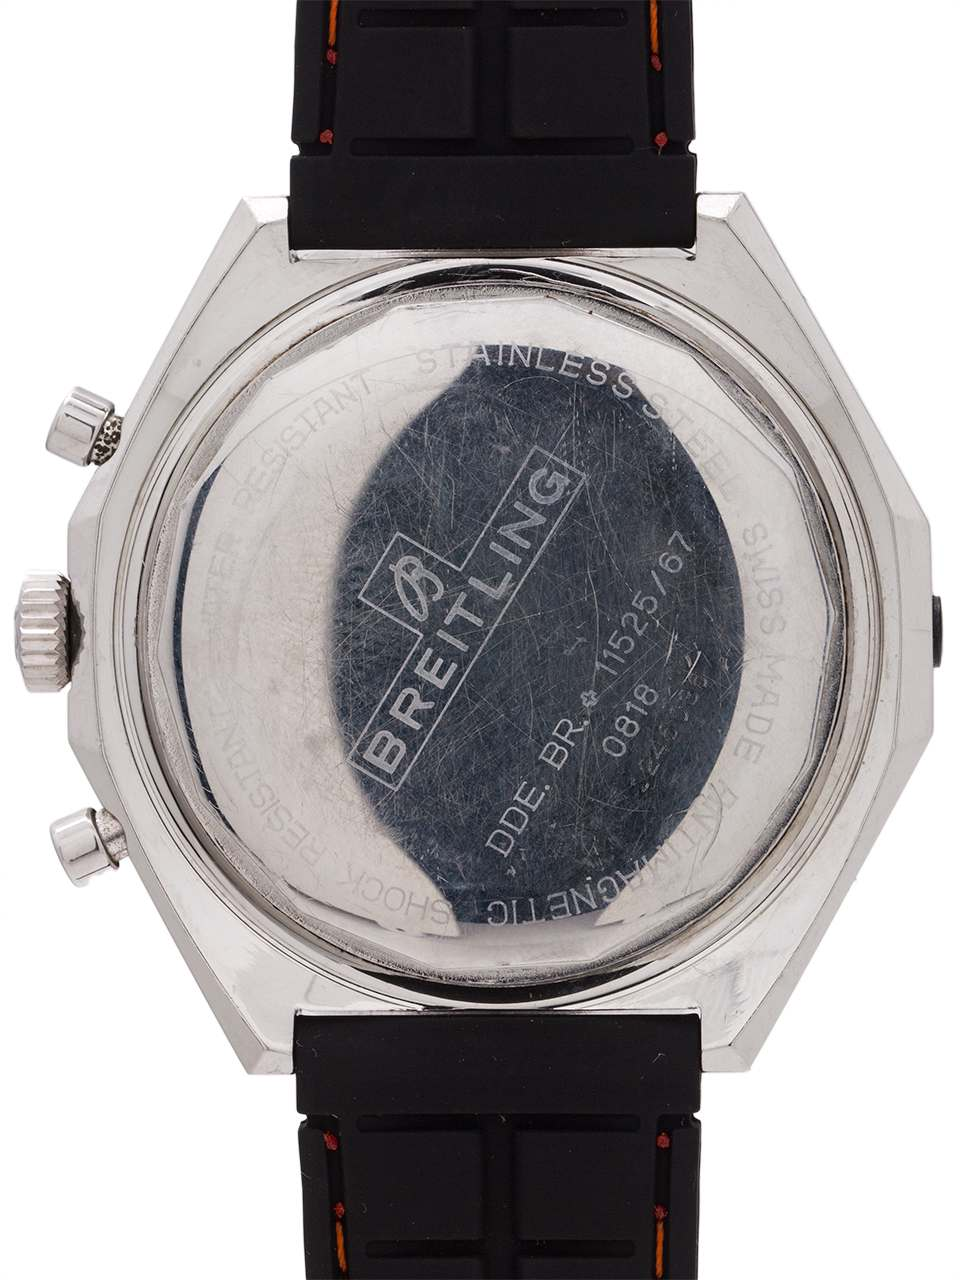 Breitling Chronomat ref# 0818 circa 1970's